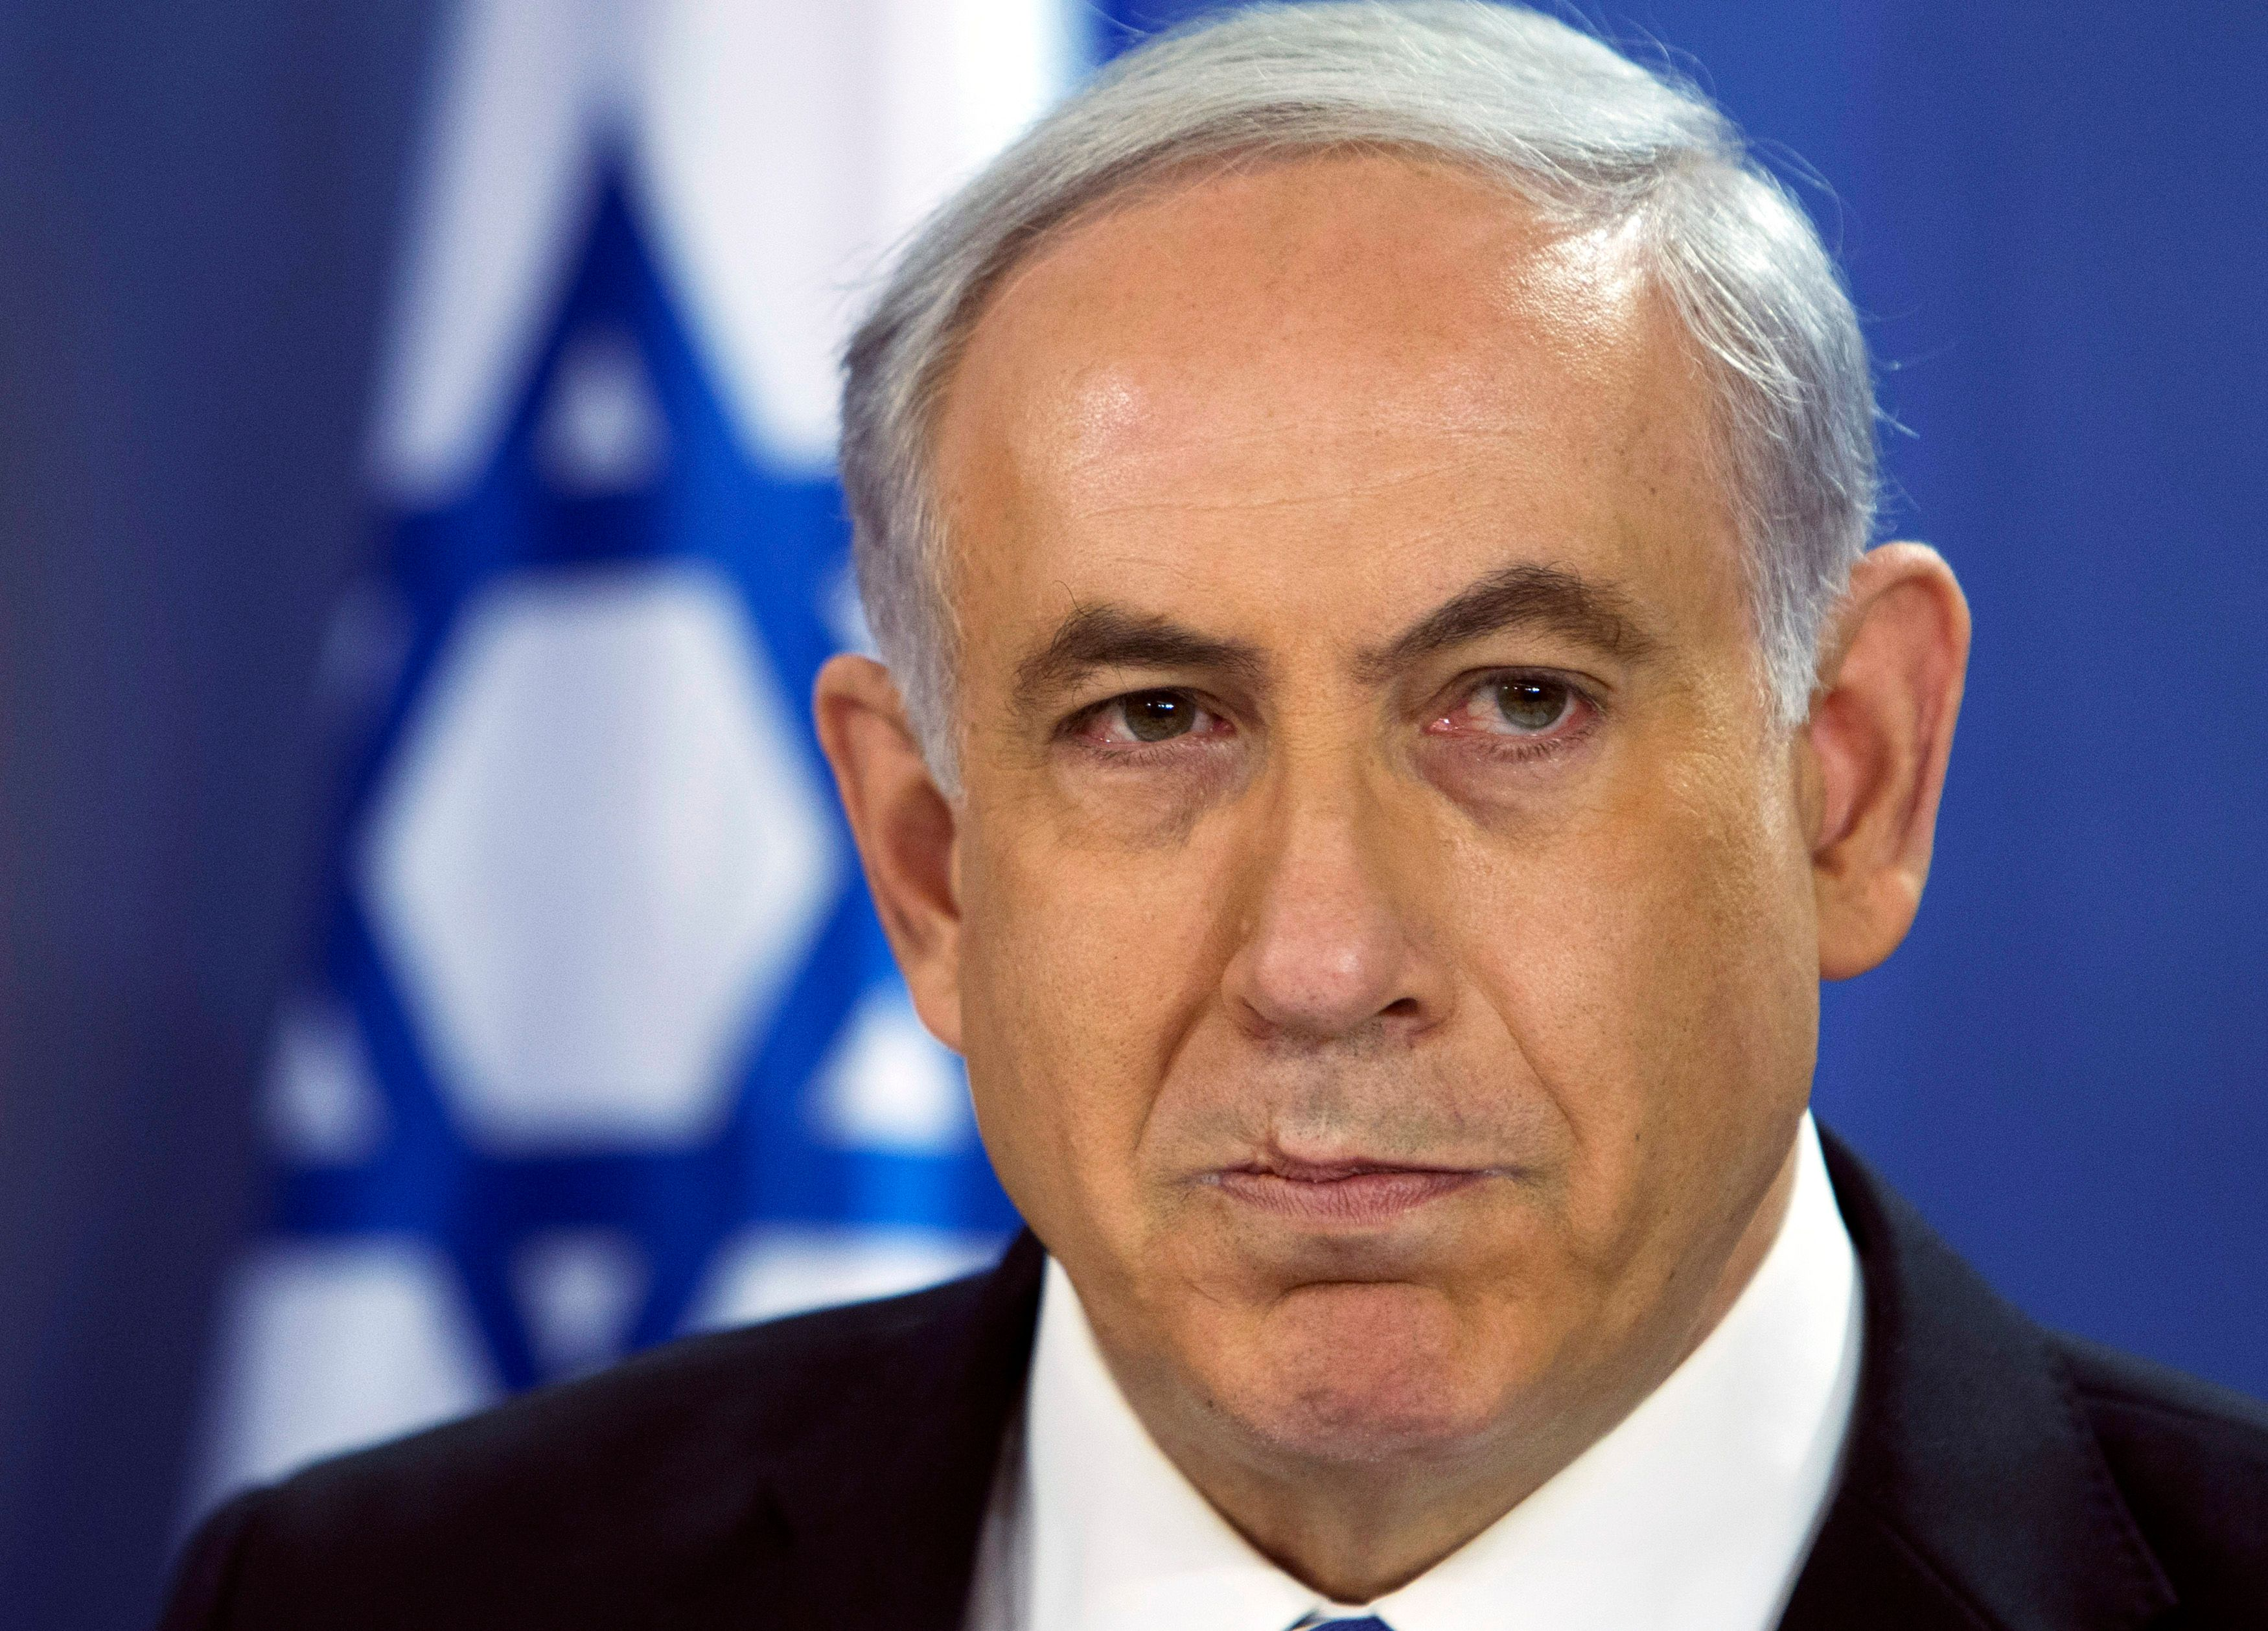 Benyamin Netanyahou, Primier ministre israelien.